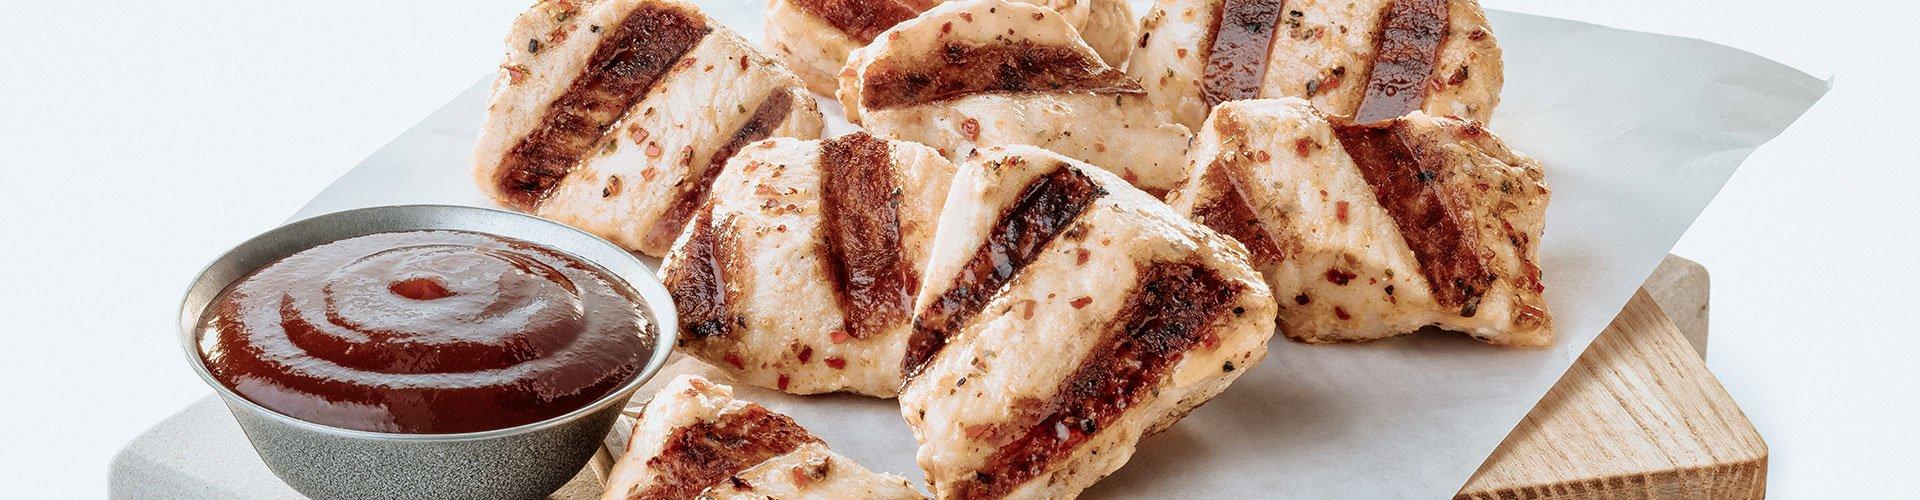 Chick Fil A grilled chicken